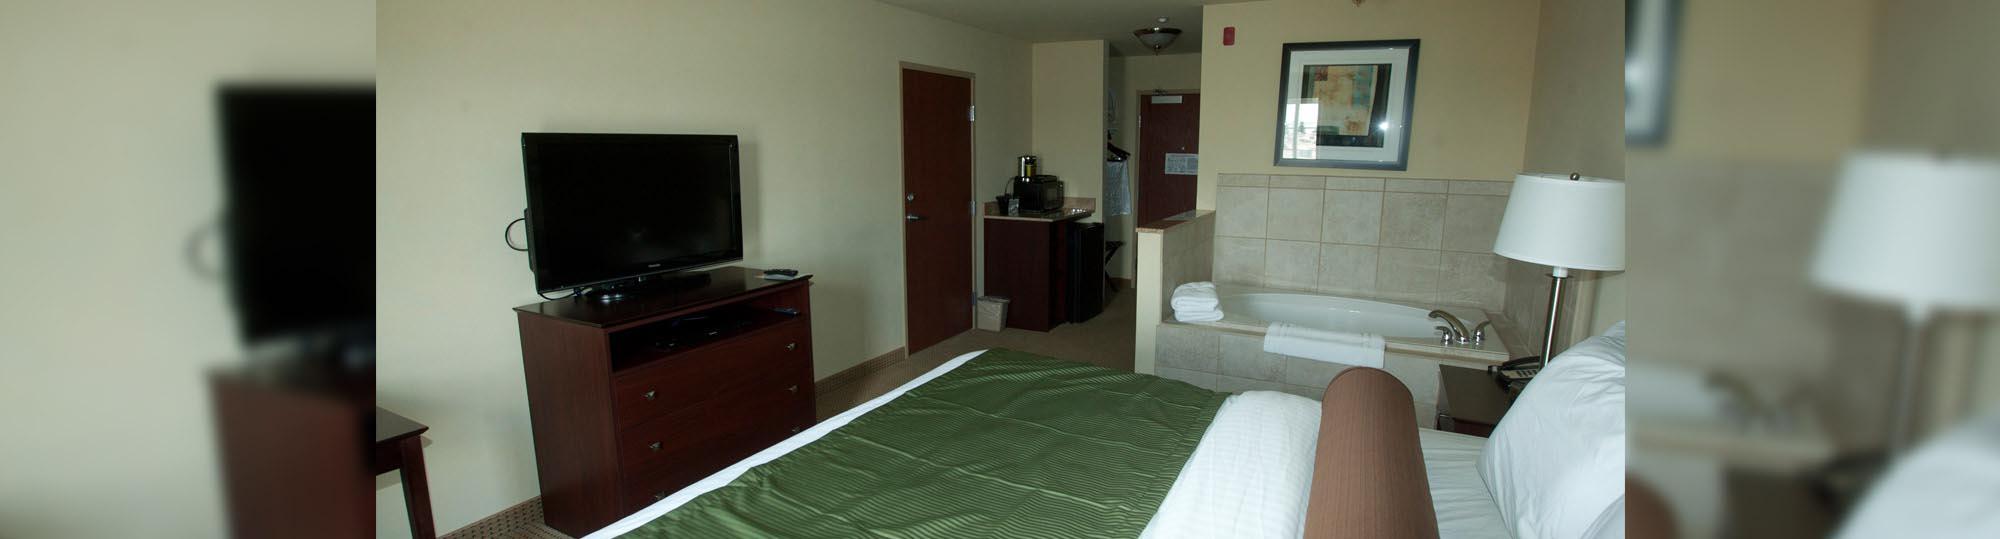 Cobblestone Inn & Suites Langdon